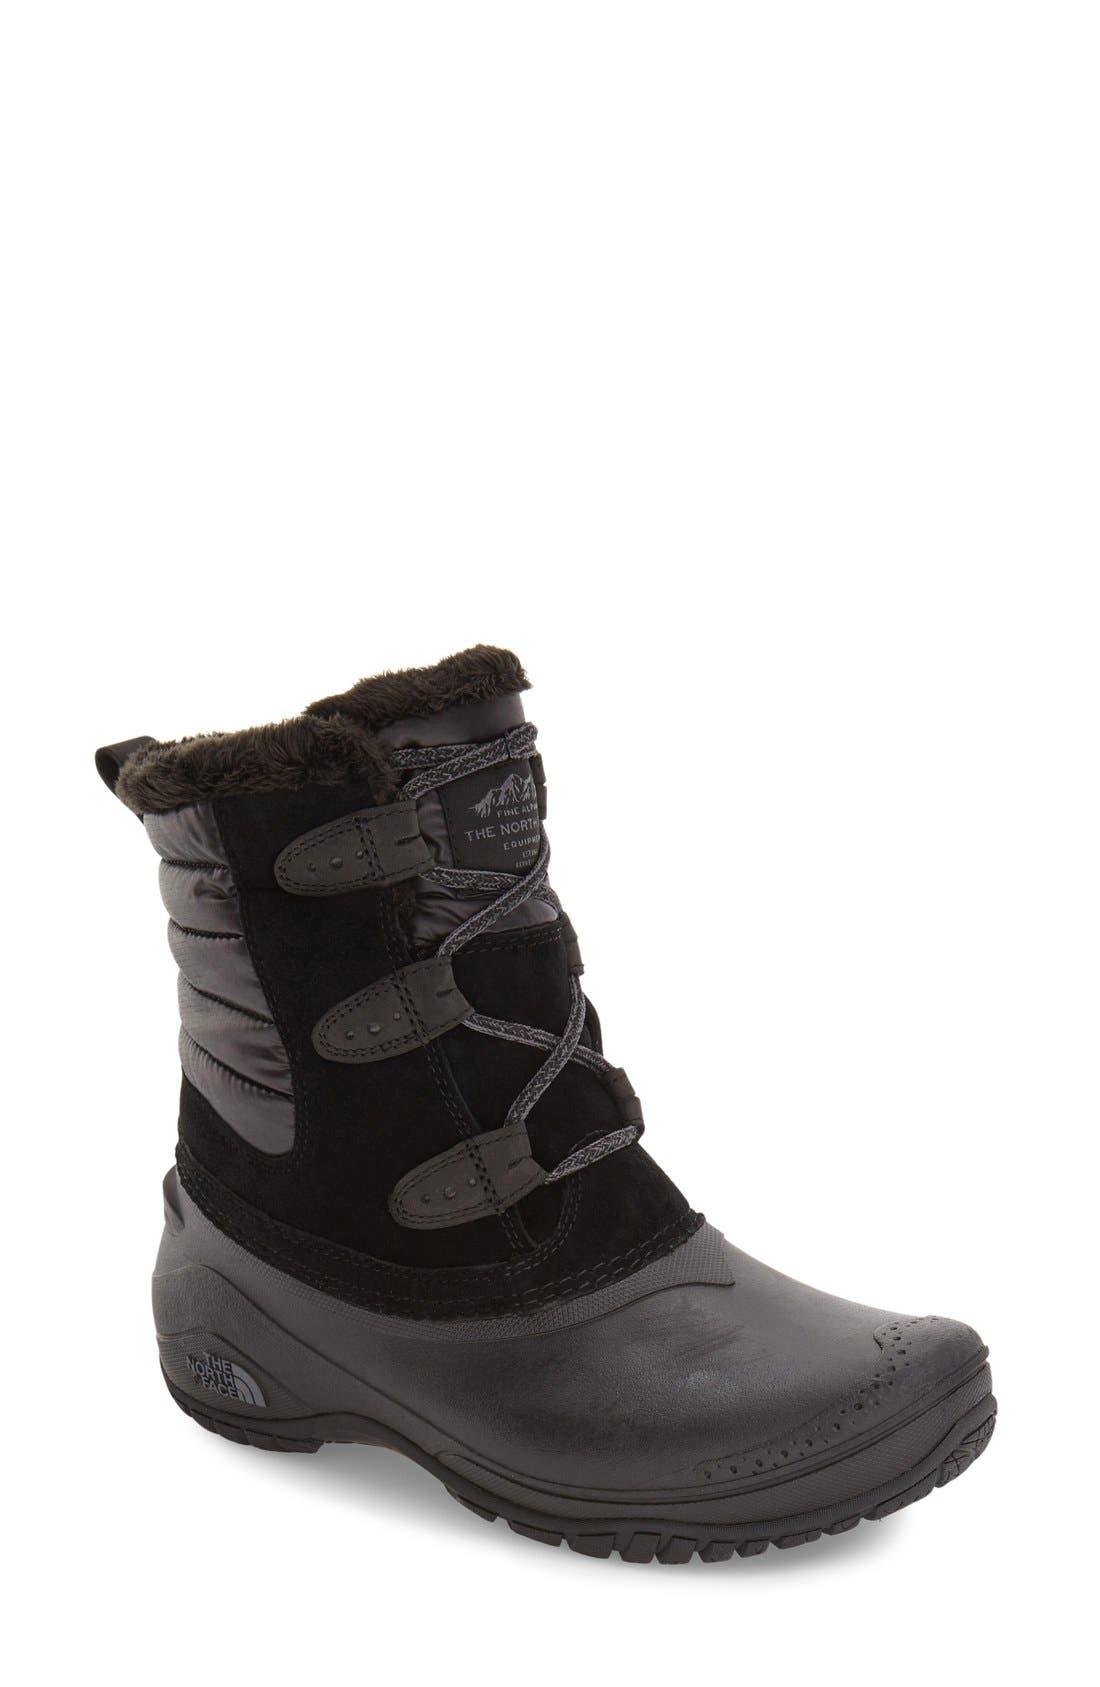 Shellista II Waterproof Boot,                             Main thumbnail 1, color,                             BLACK/ SMOKED PEARL GREY